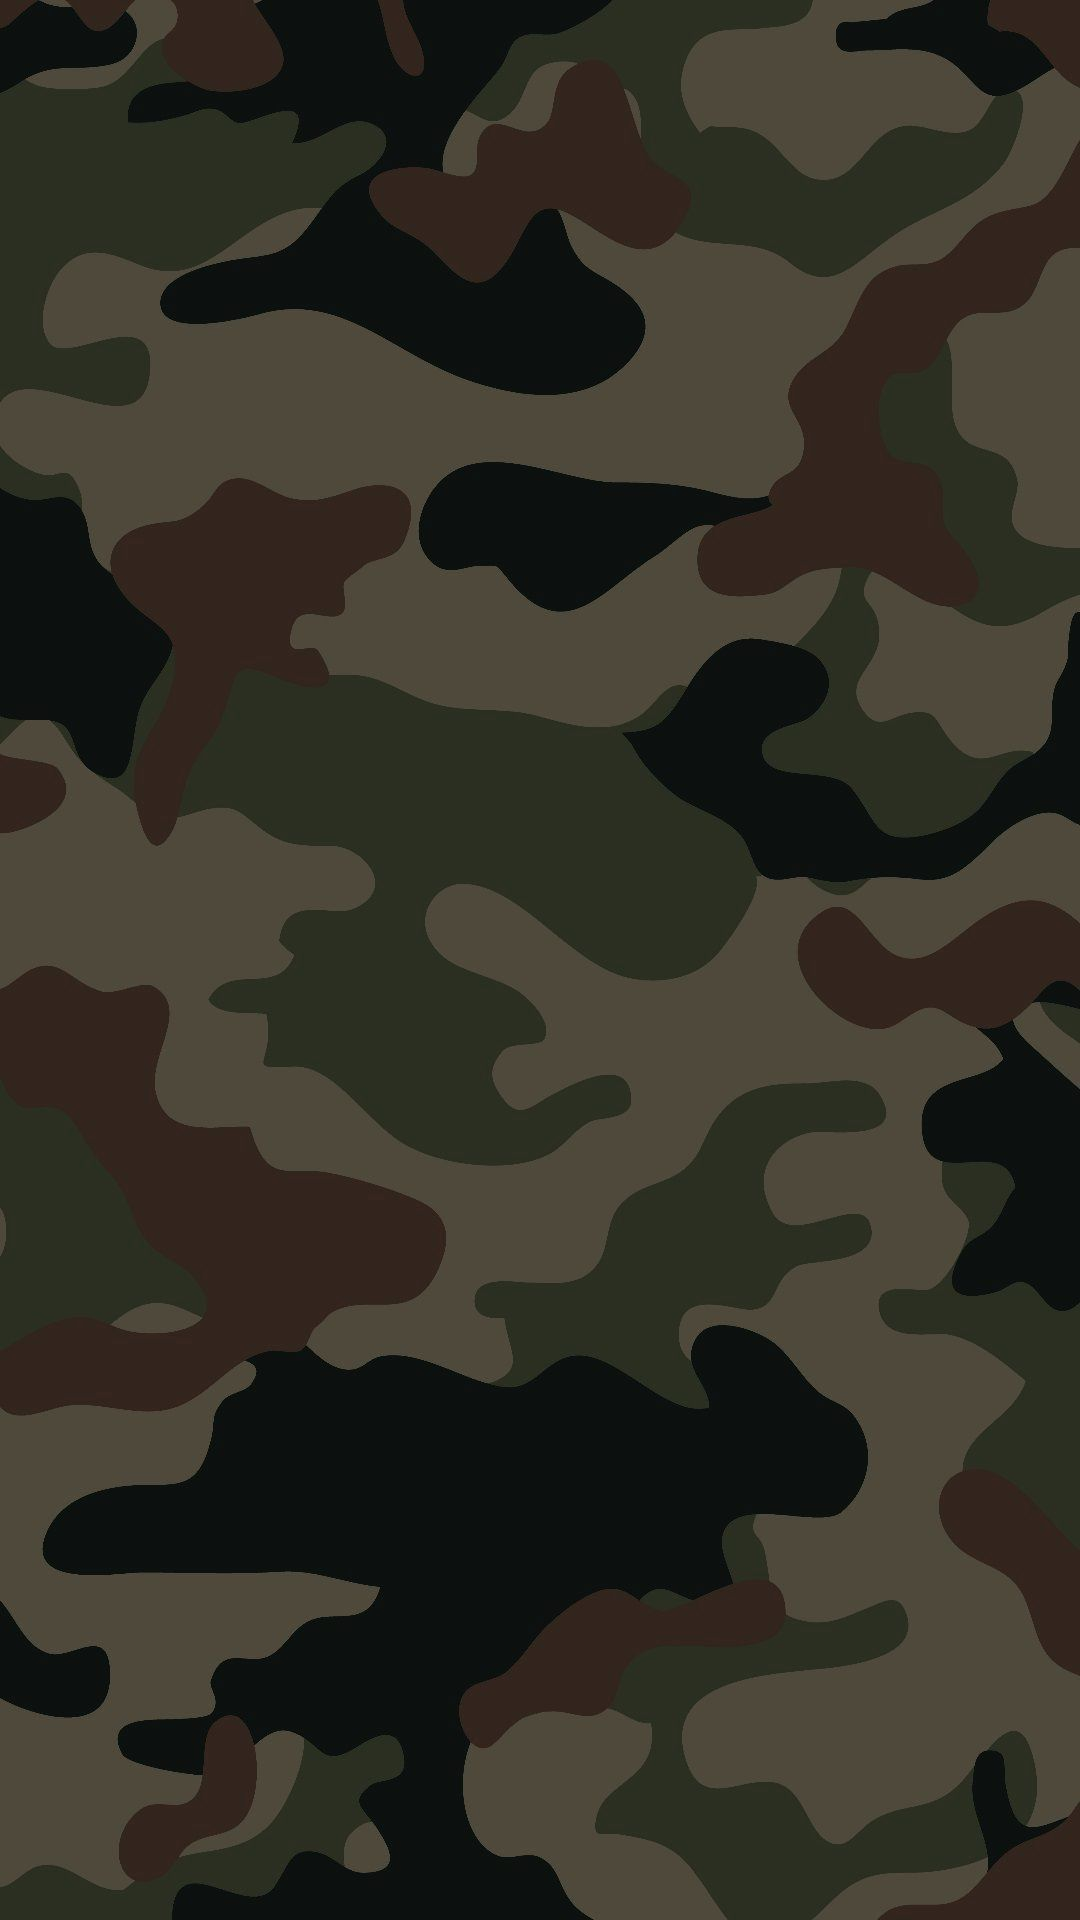 Gadgets Para Windows 10 Gratis By Wallpaper Iphone X Engine Camo Wallpaper Camouflage Wallpaper Army Wallpaper